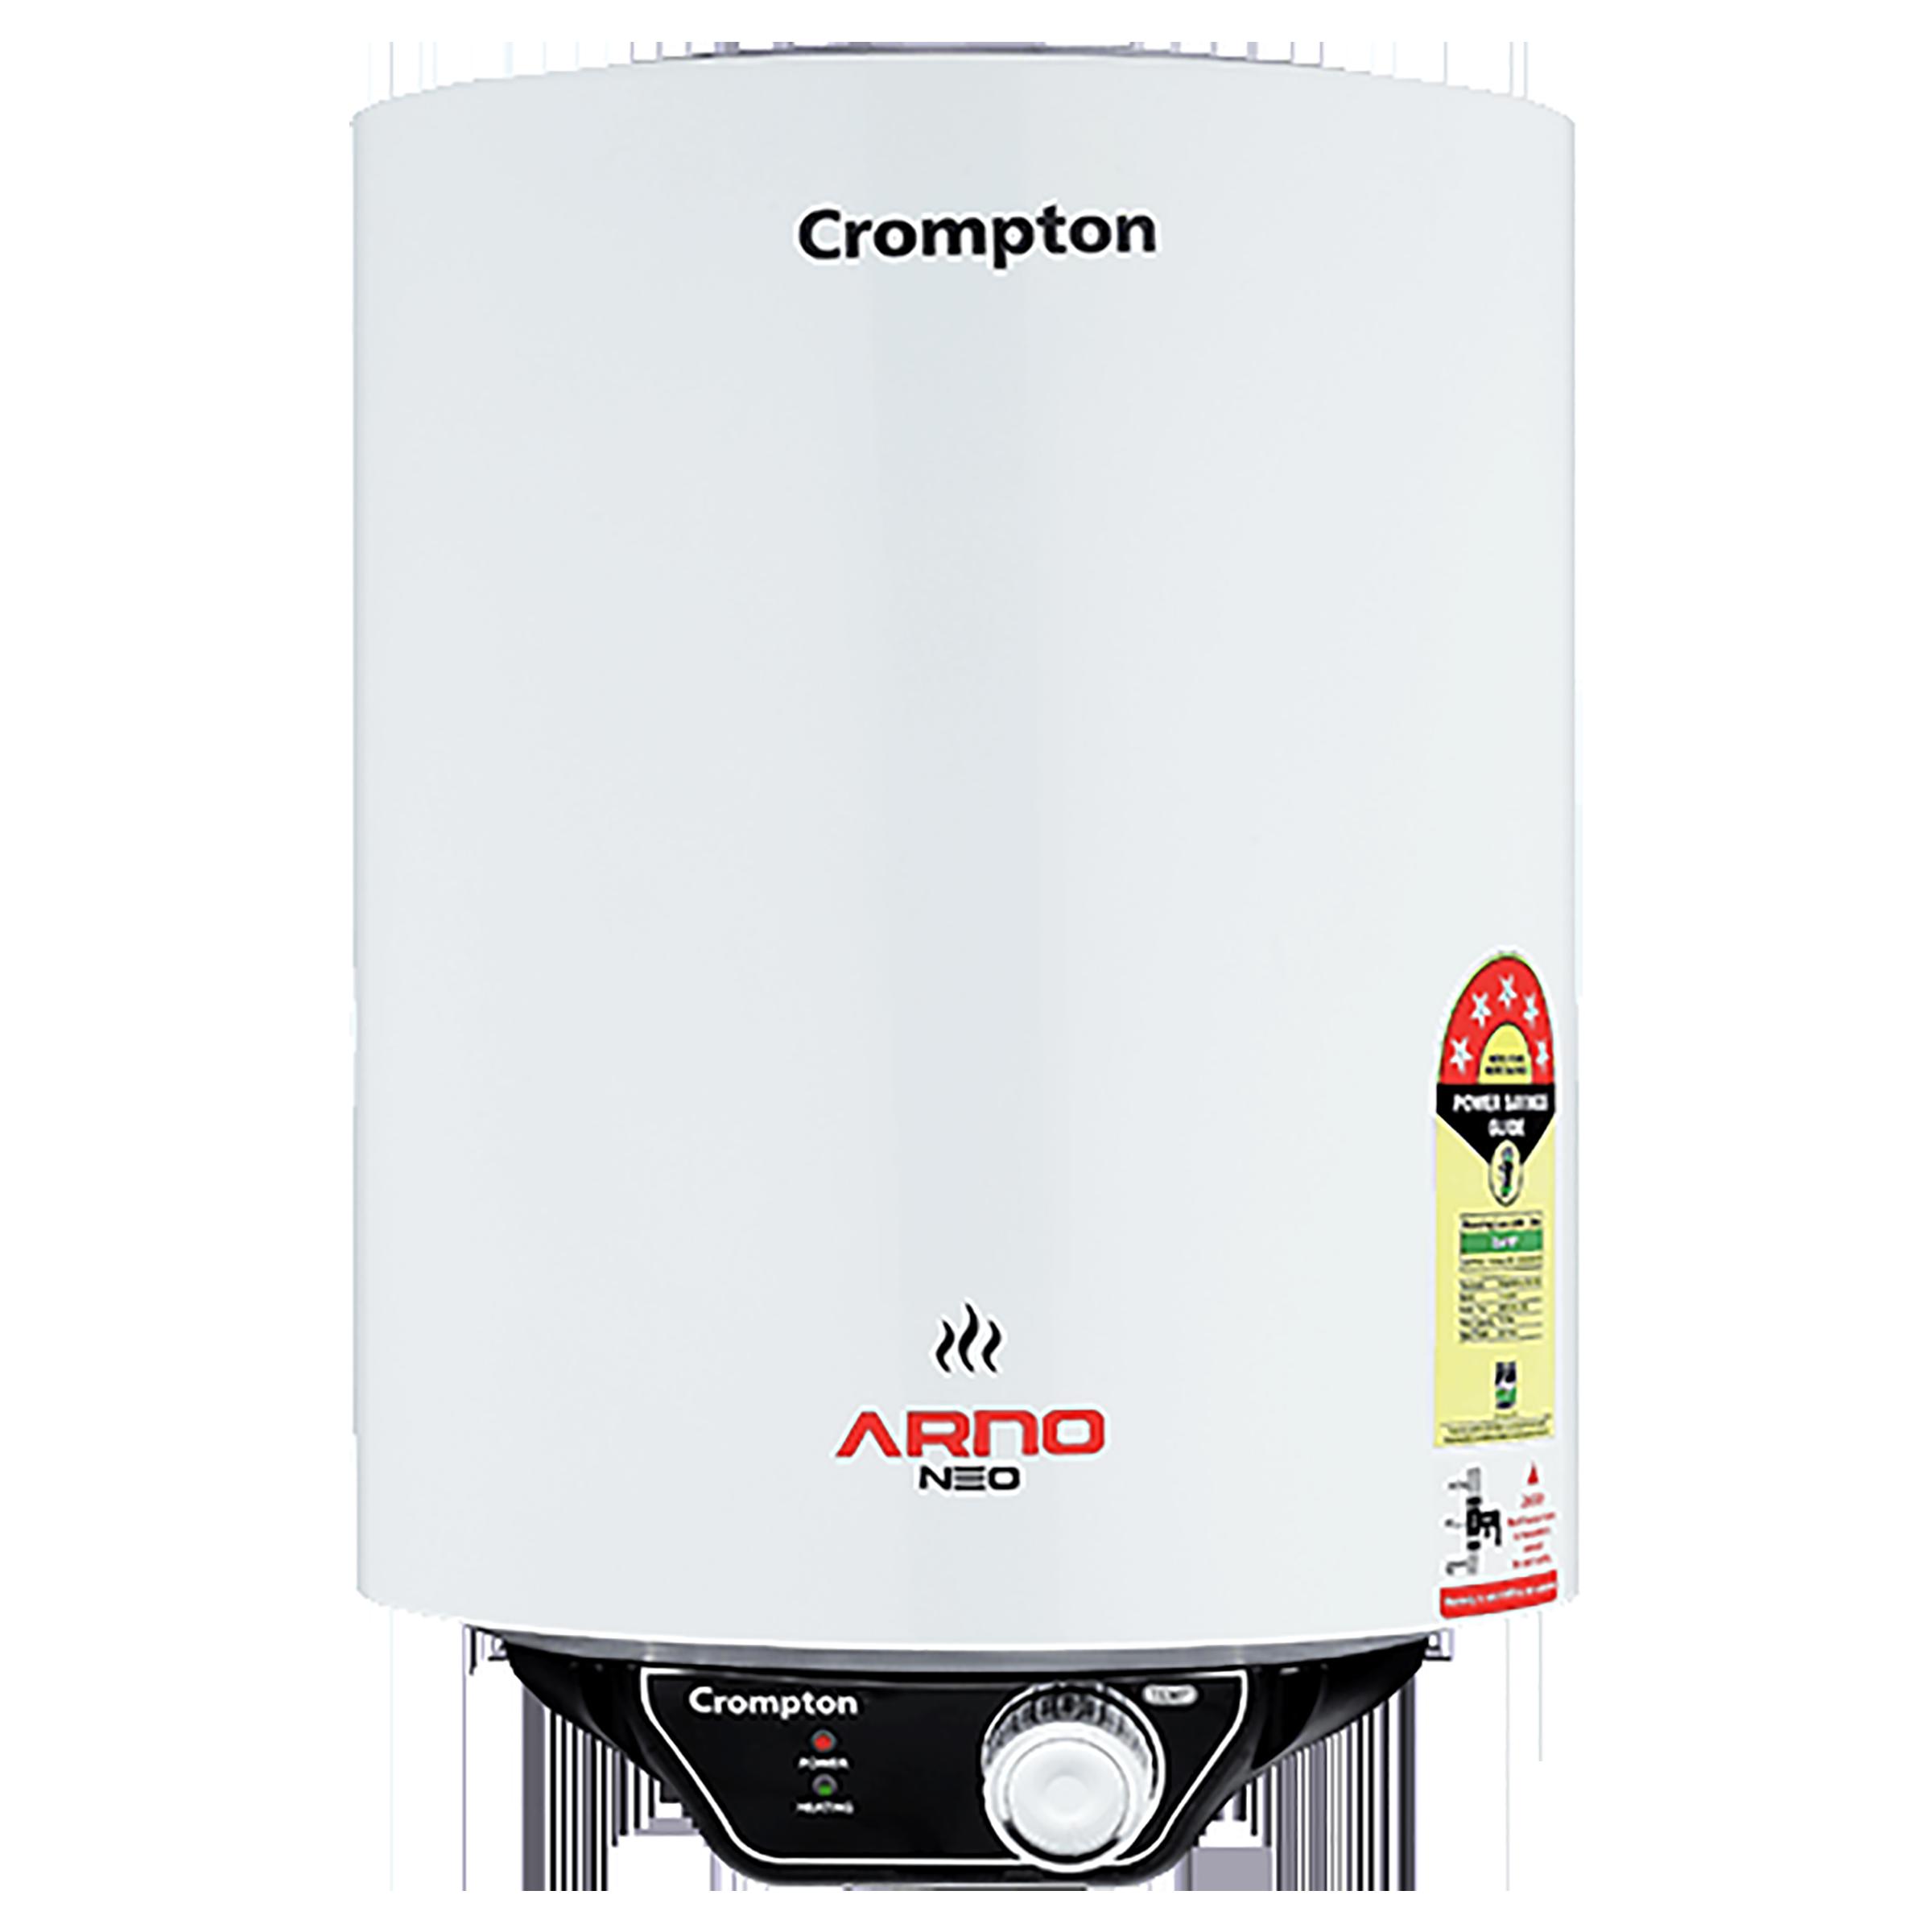 Crompton Arno Neo 6 Litres 5 Star Storage Water Geyser (2000 Watts, ASWH-3006, White)_1